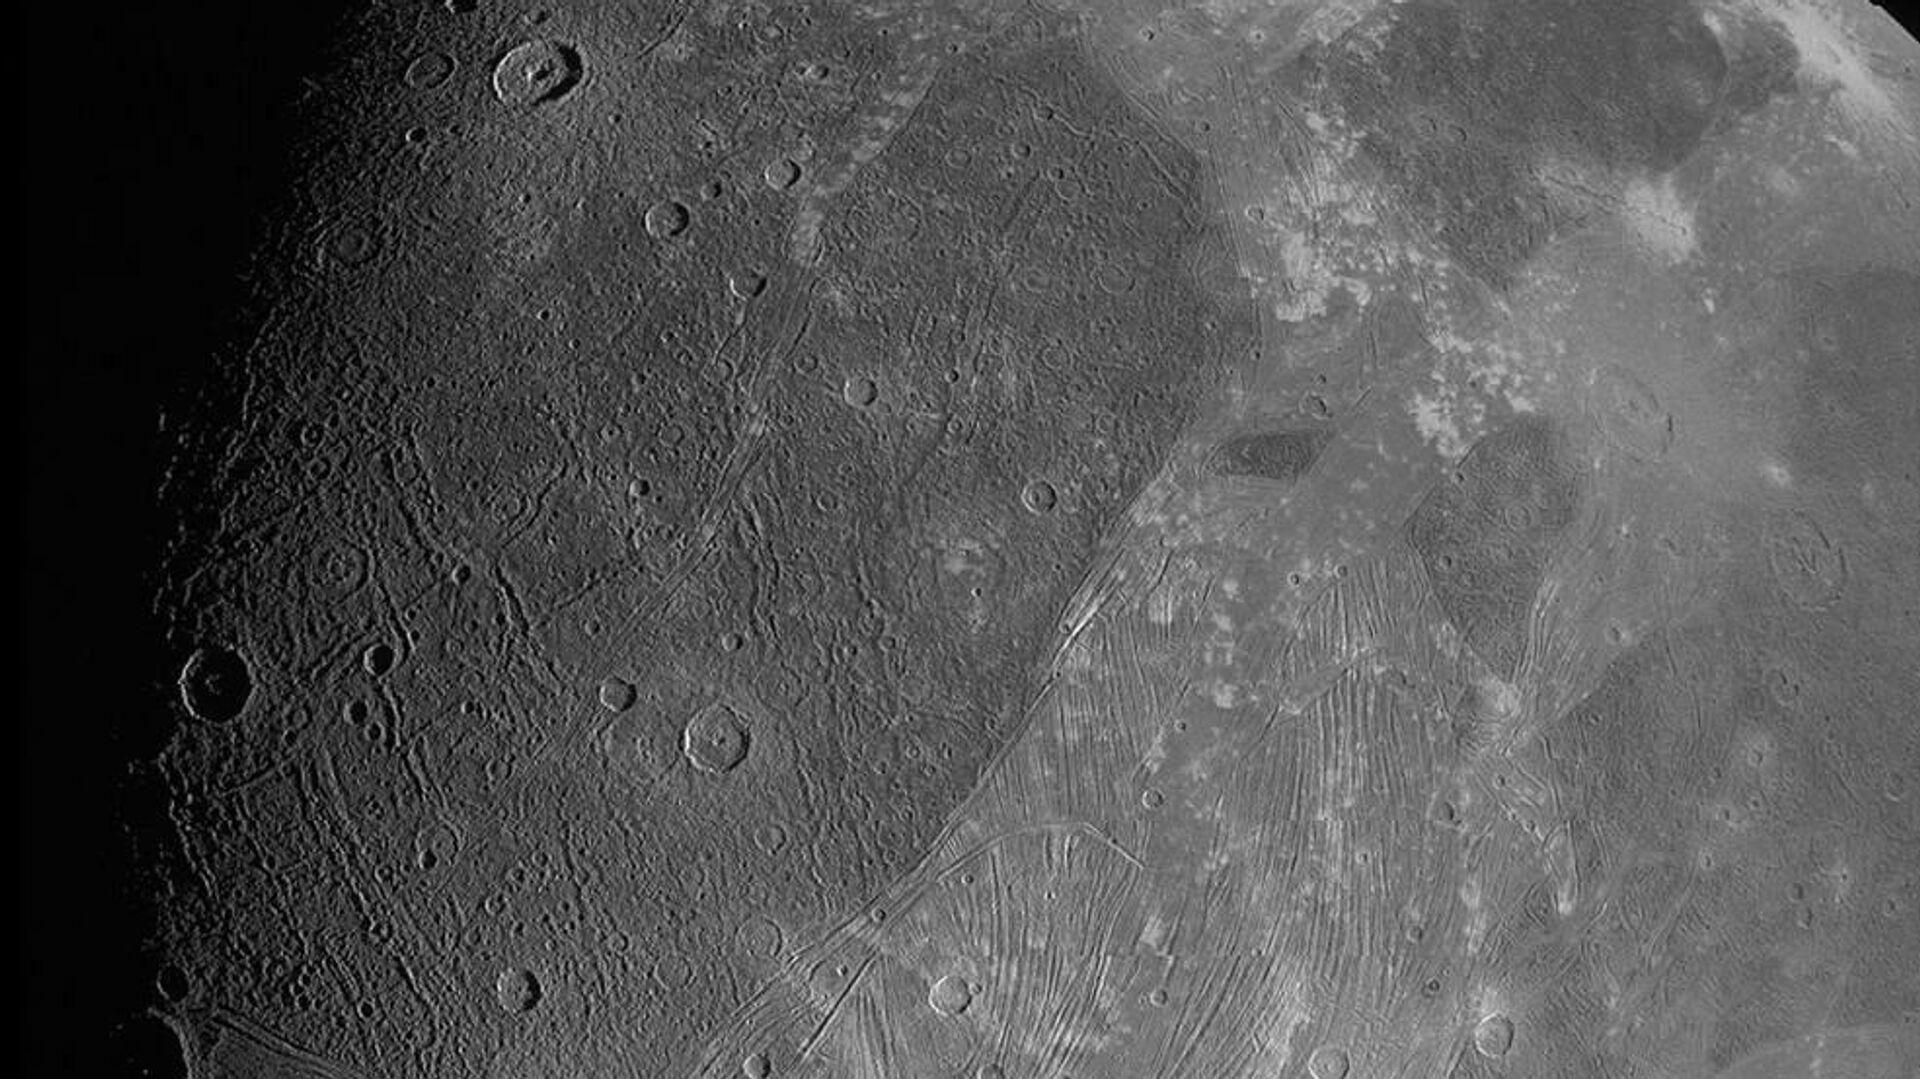 Juno fotografa Ganimede - Sputnik Italia, 1920, 27.07.2021